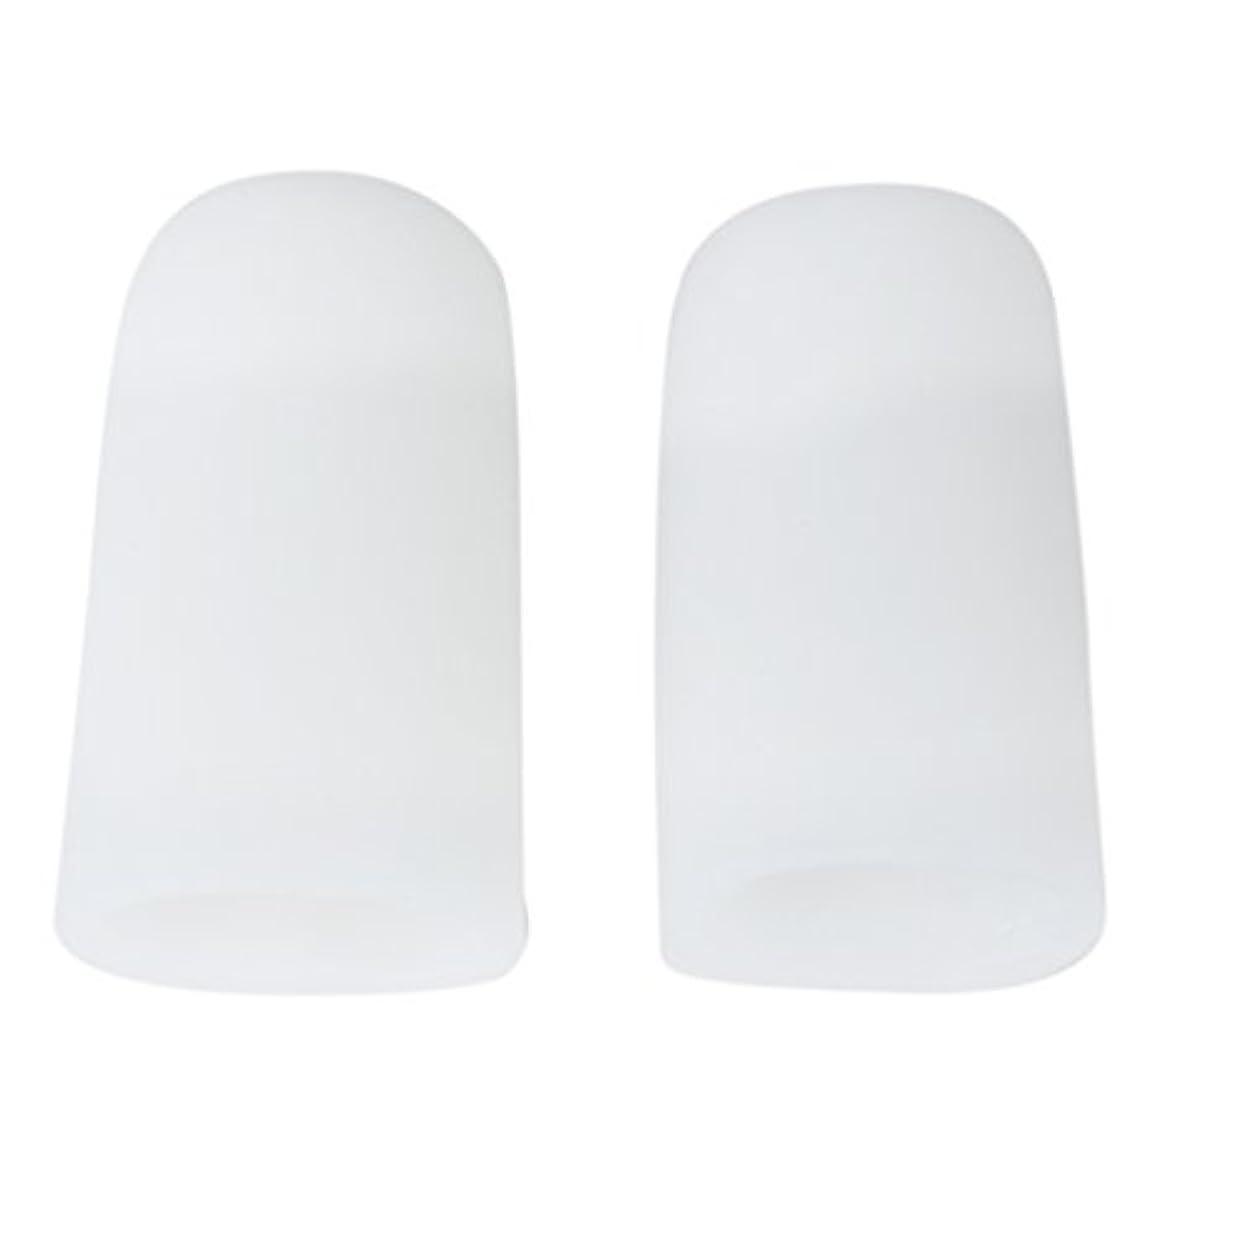 【Footful】足指保護キャップ つま先プロテクター 足先のつめ保護キャップ シリコン (L)